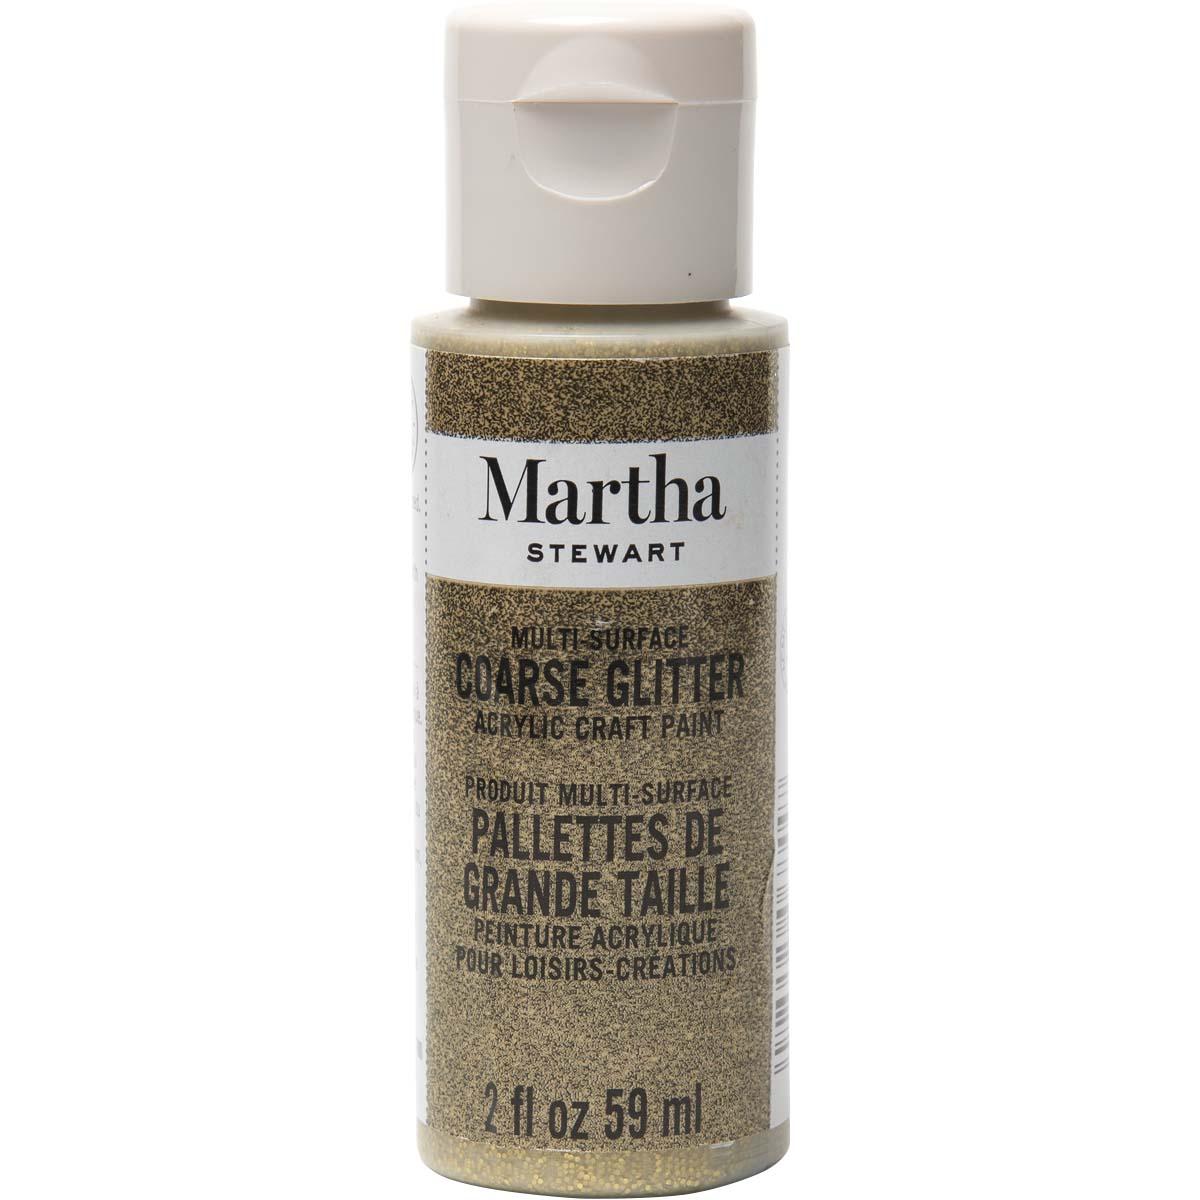 Martha Stewart ® Multi-Surface Coarse Glitter Acrylic Craft Paint - Florentine Gold, 2 oz. - 32961CA